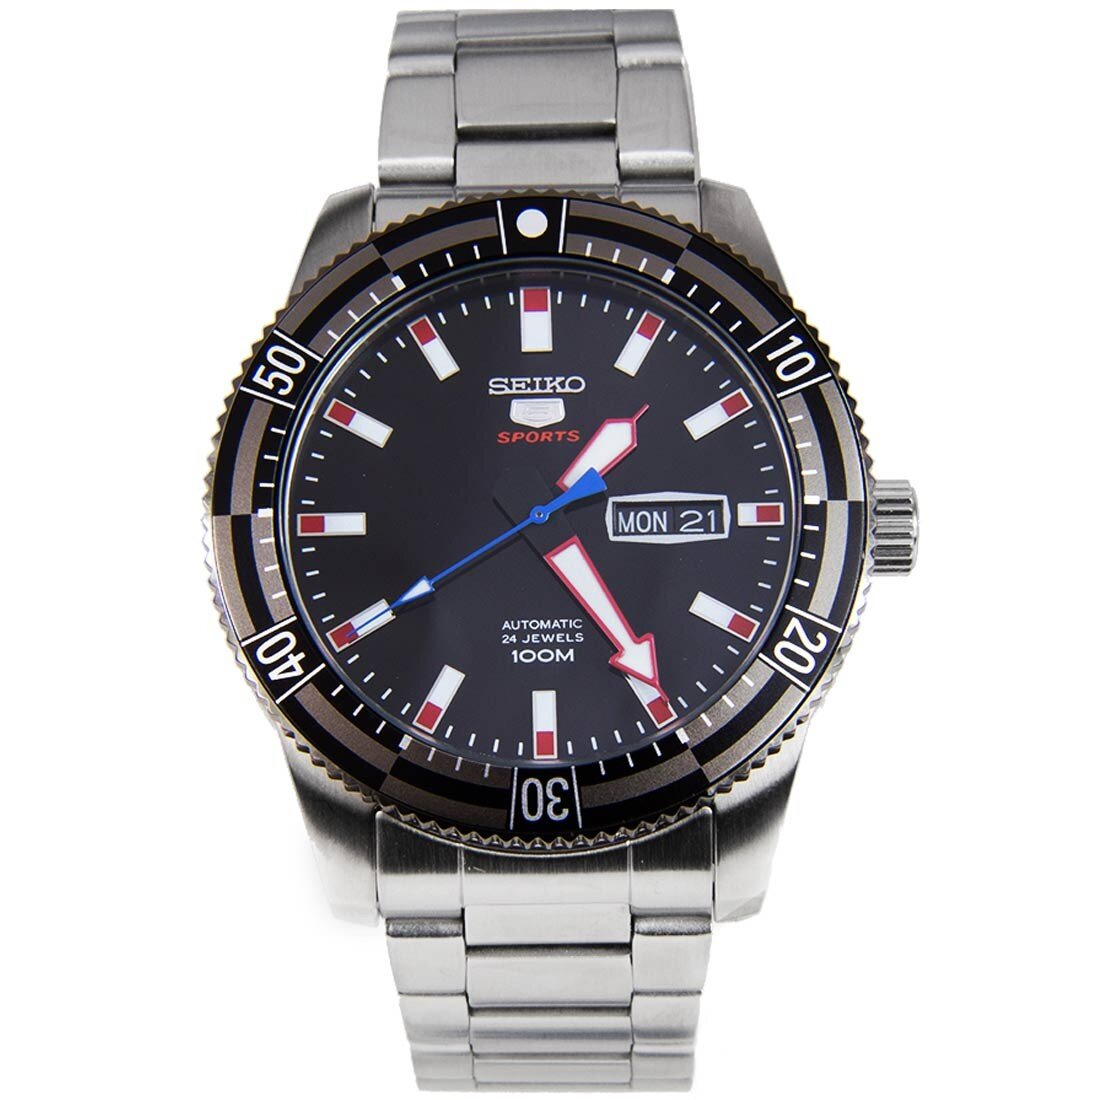 Đồng hồ Seiko SRP735K1